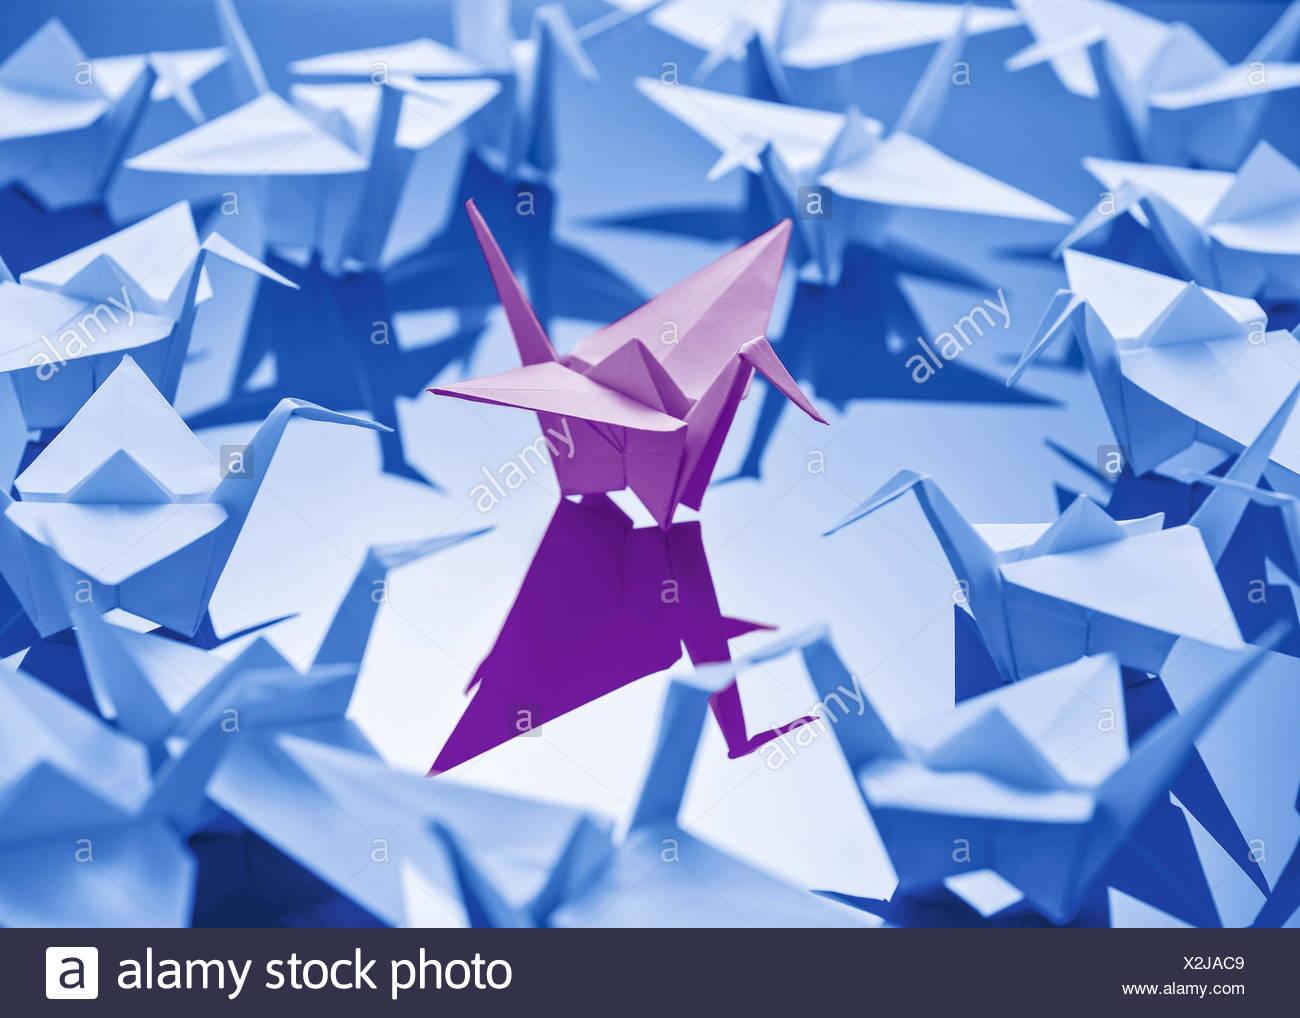 Origami, Voegel aus Papier gefaltet - Stock Image